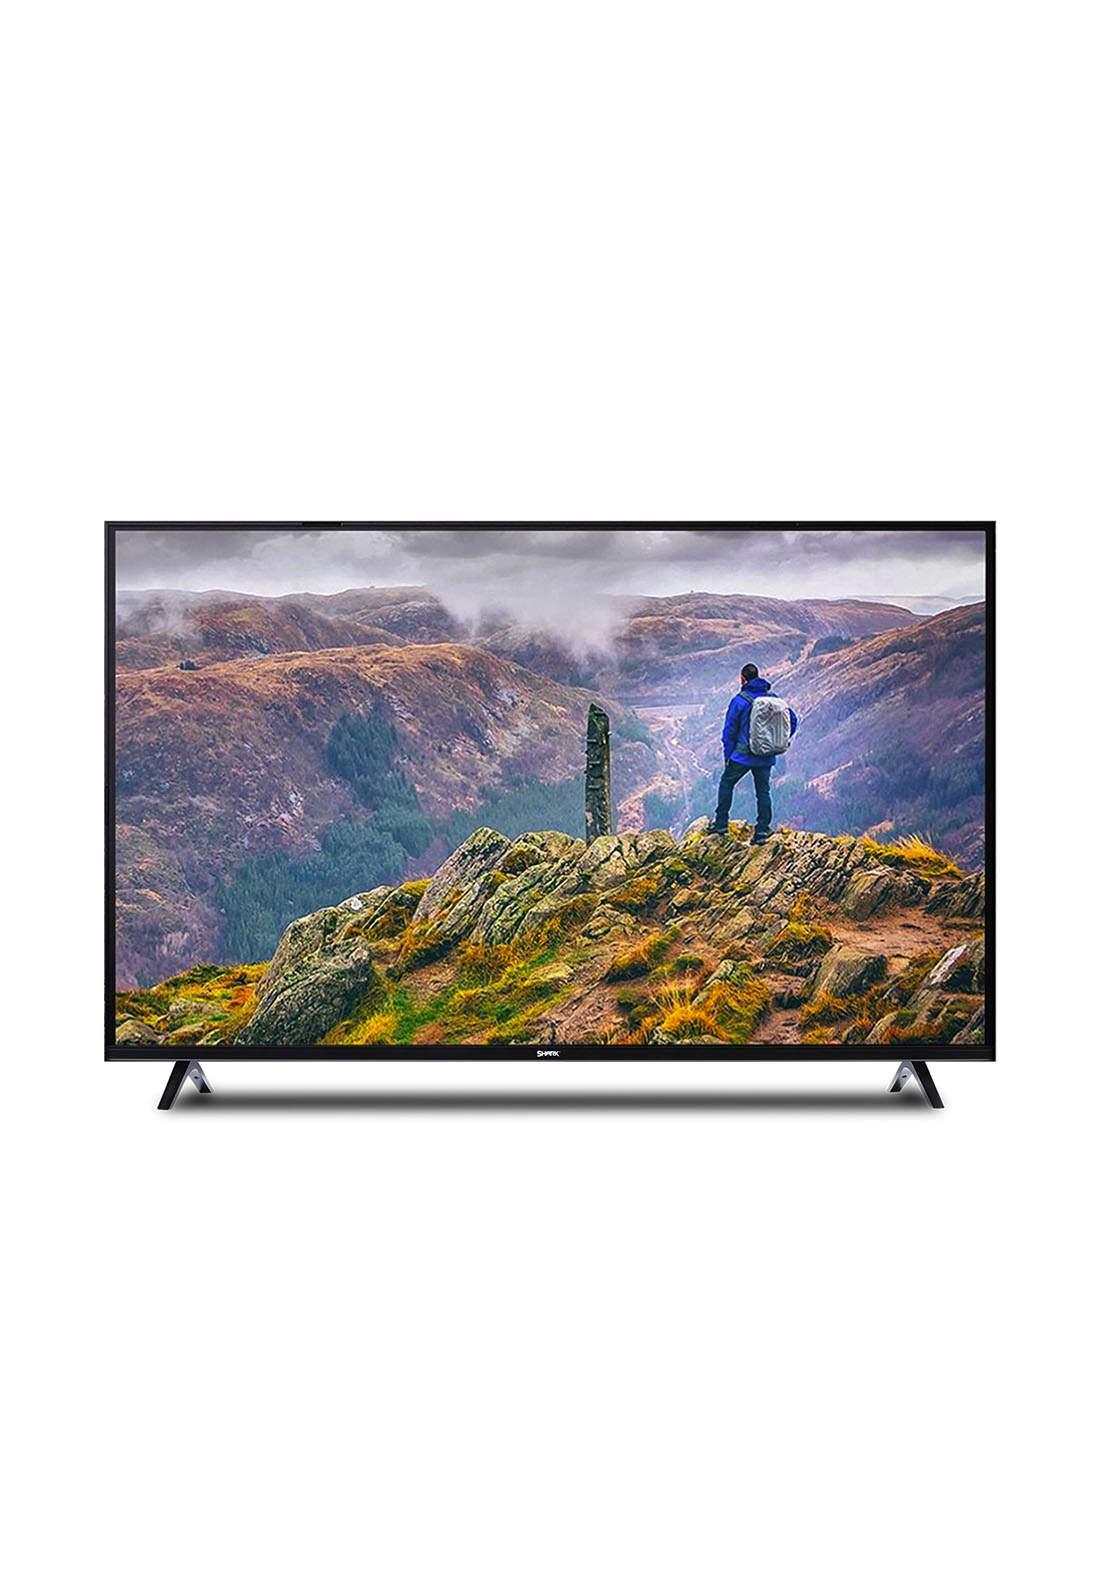 Shark Smart Led Tv - 42inch شاشة ذكية